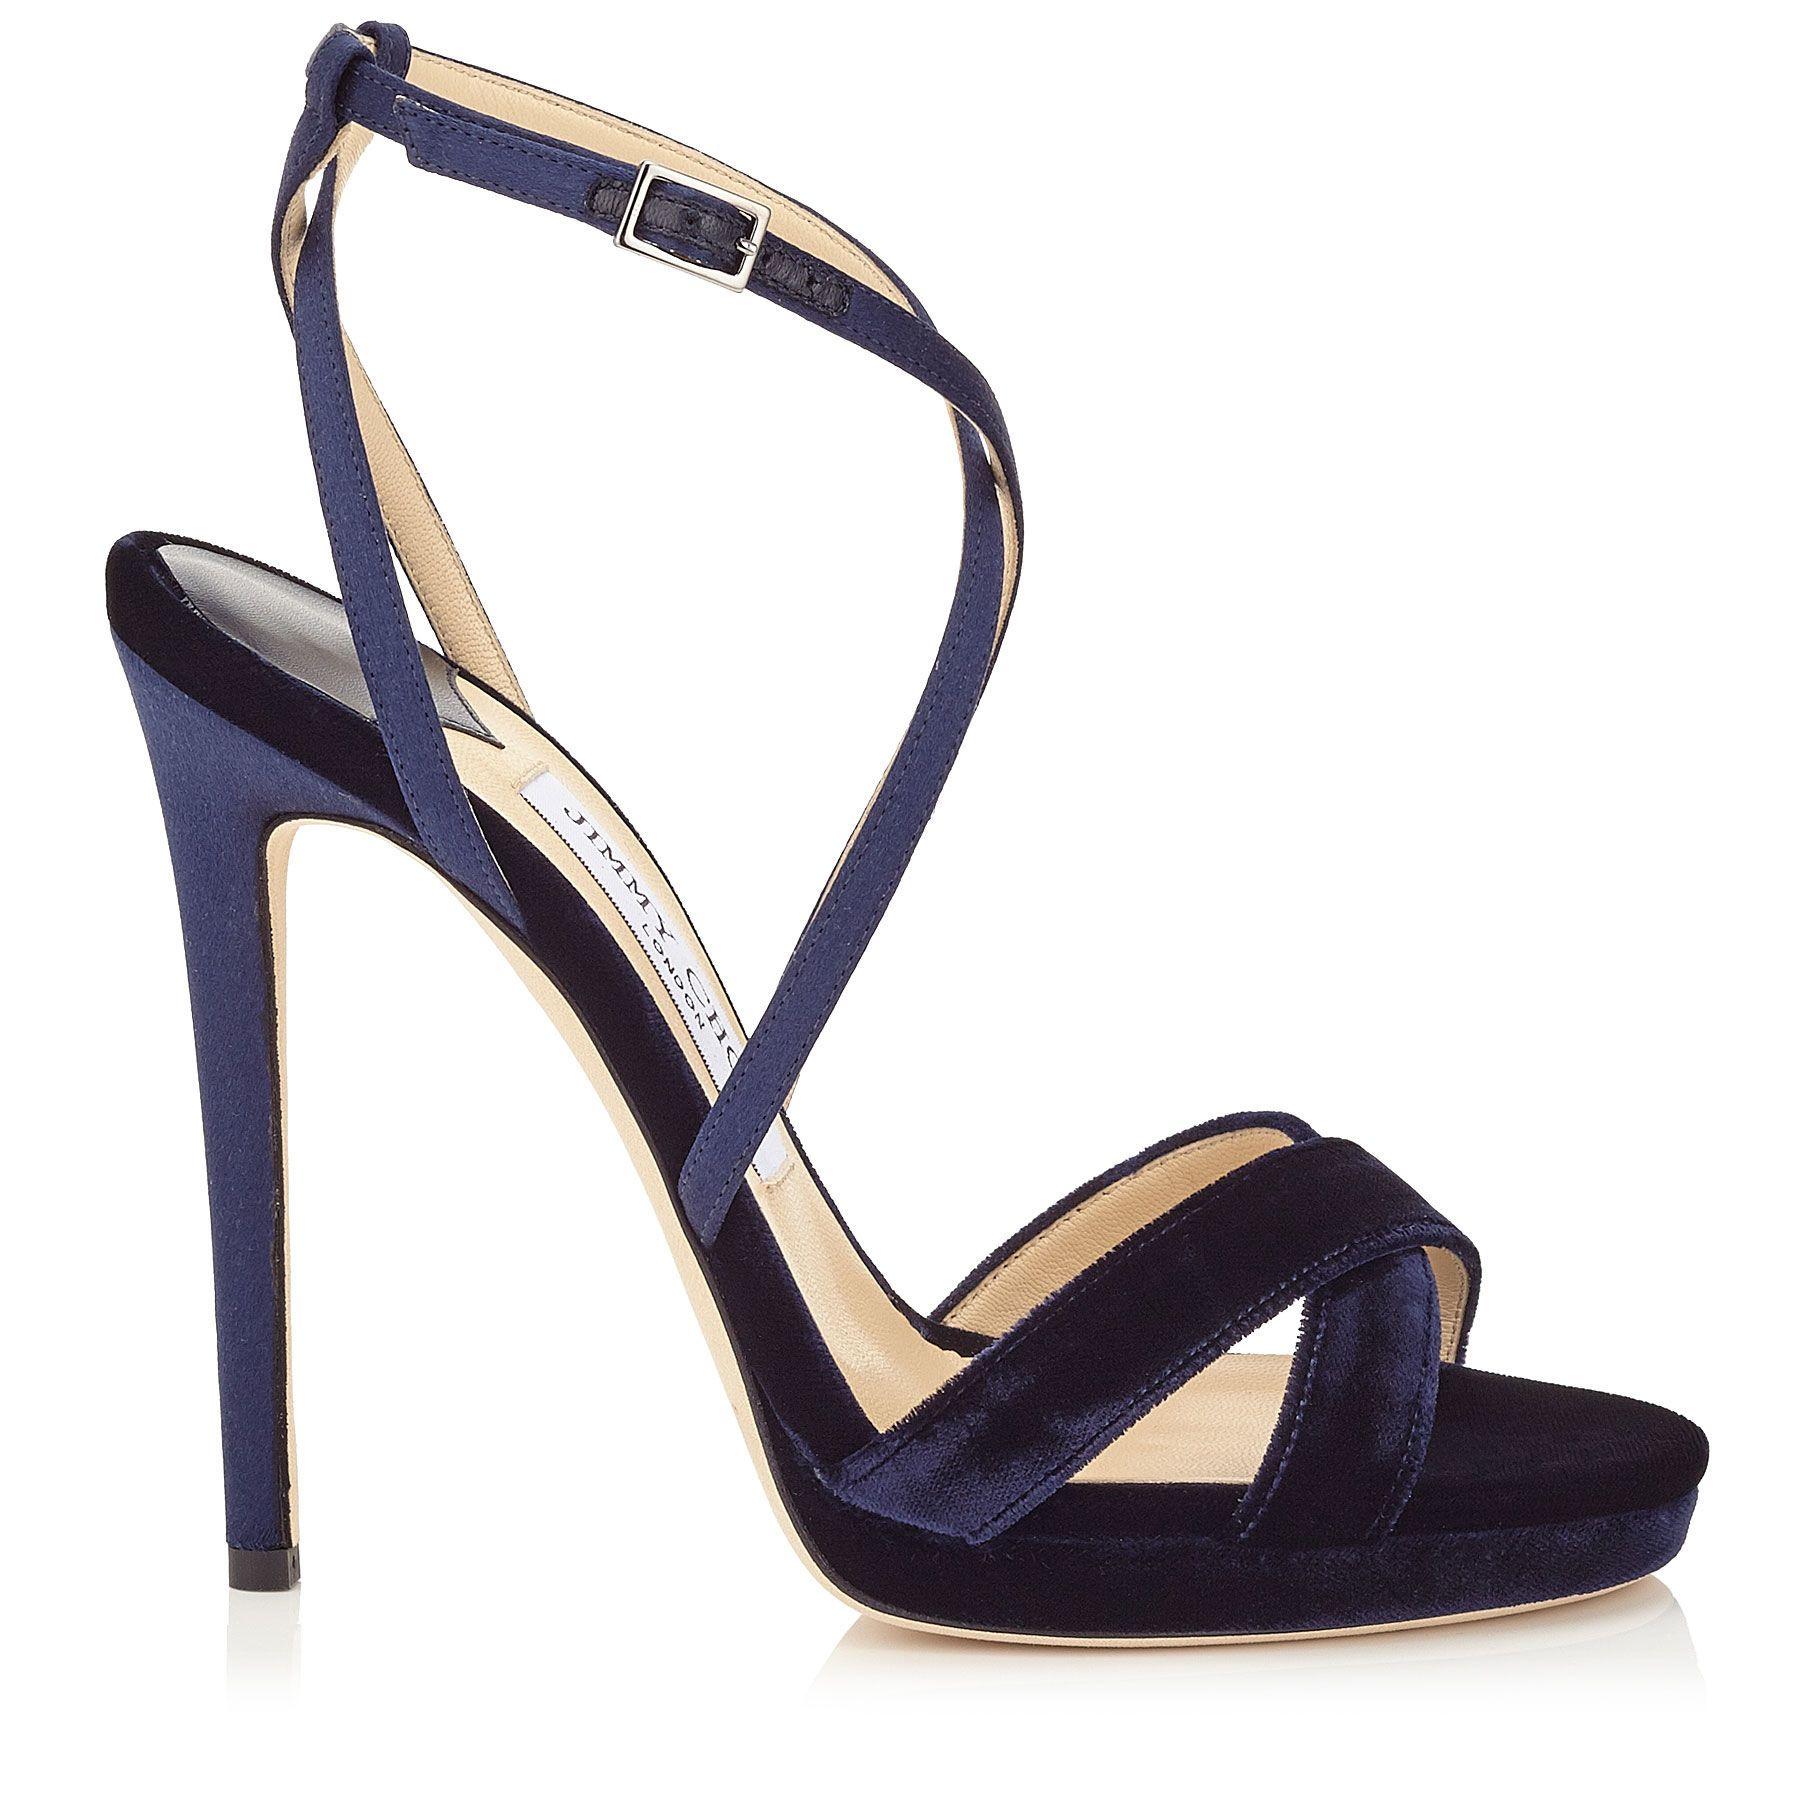 ecc811c5df5 order jimmy choo navy sandals 1318a 1840f